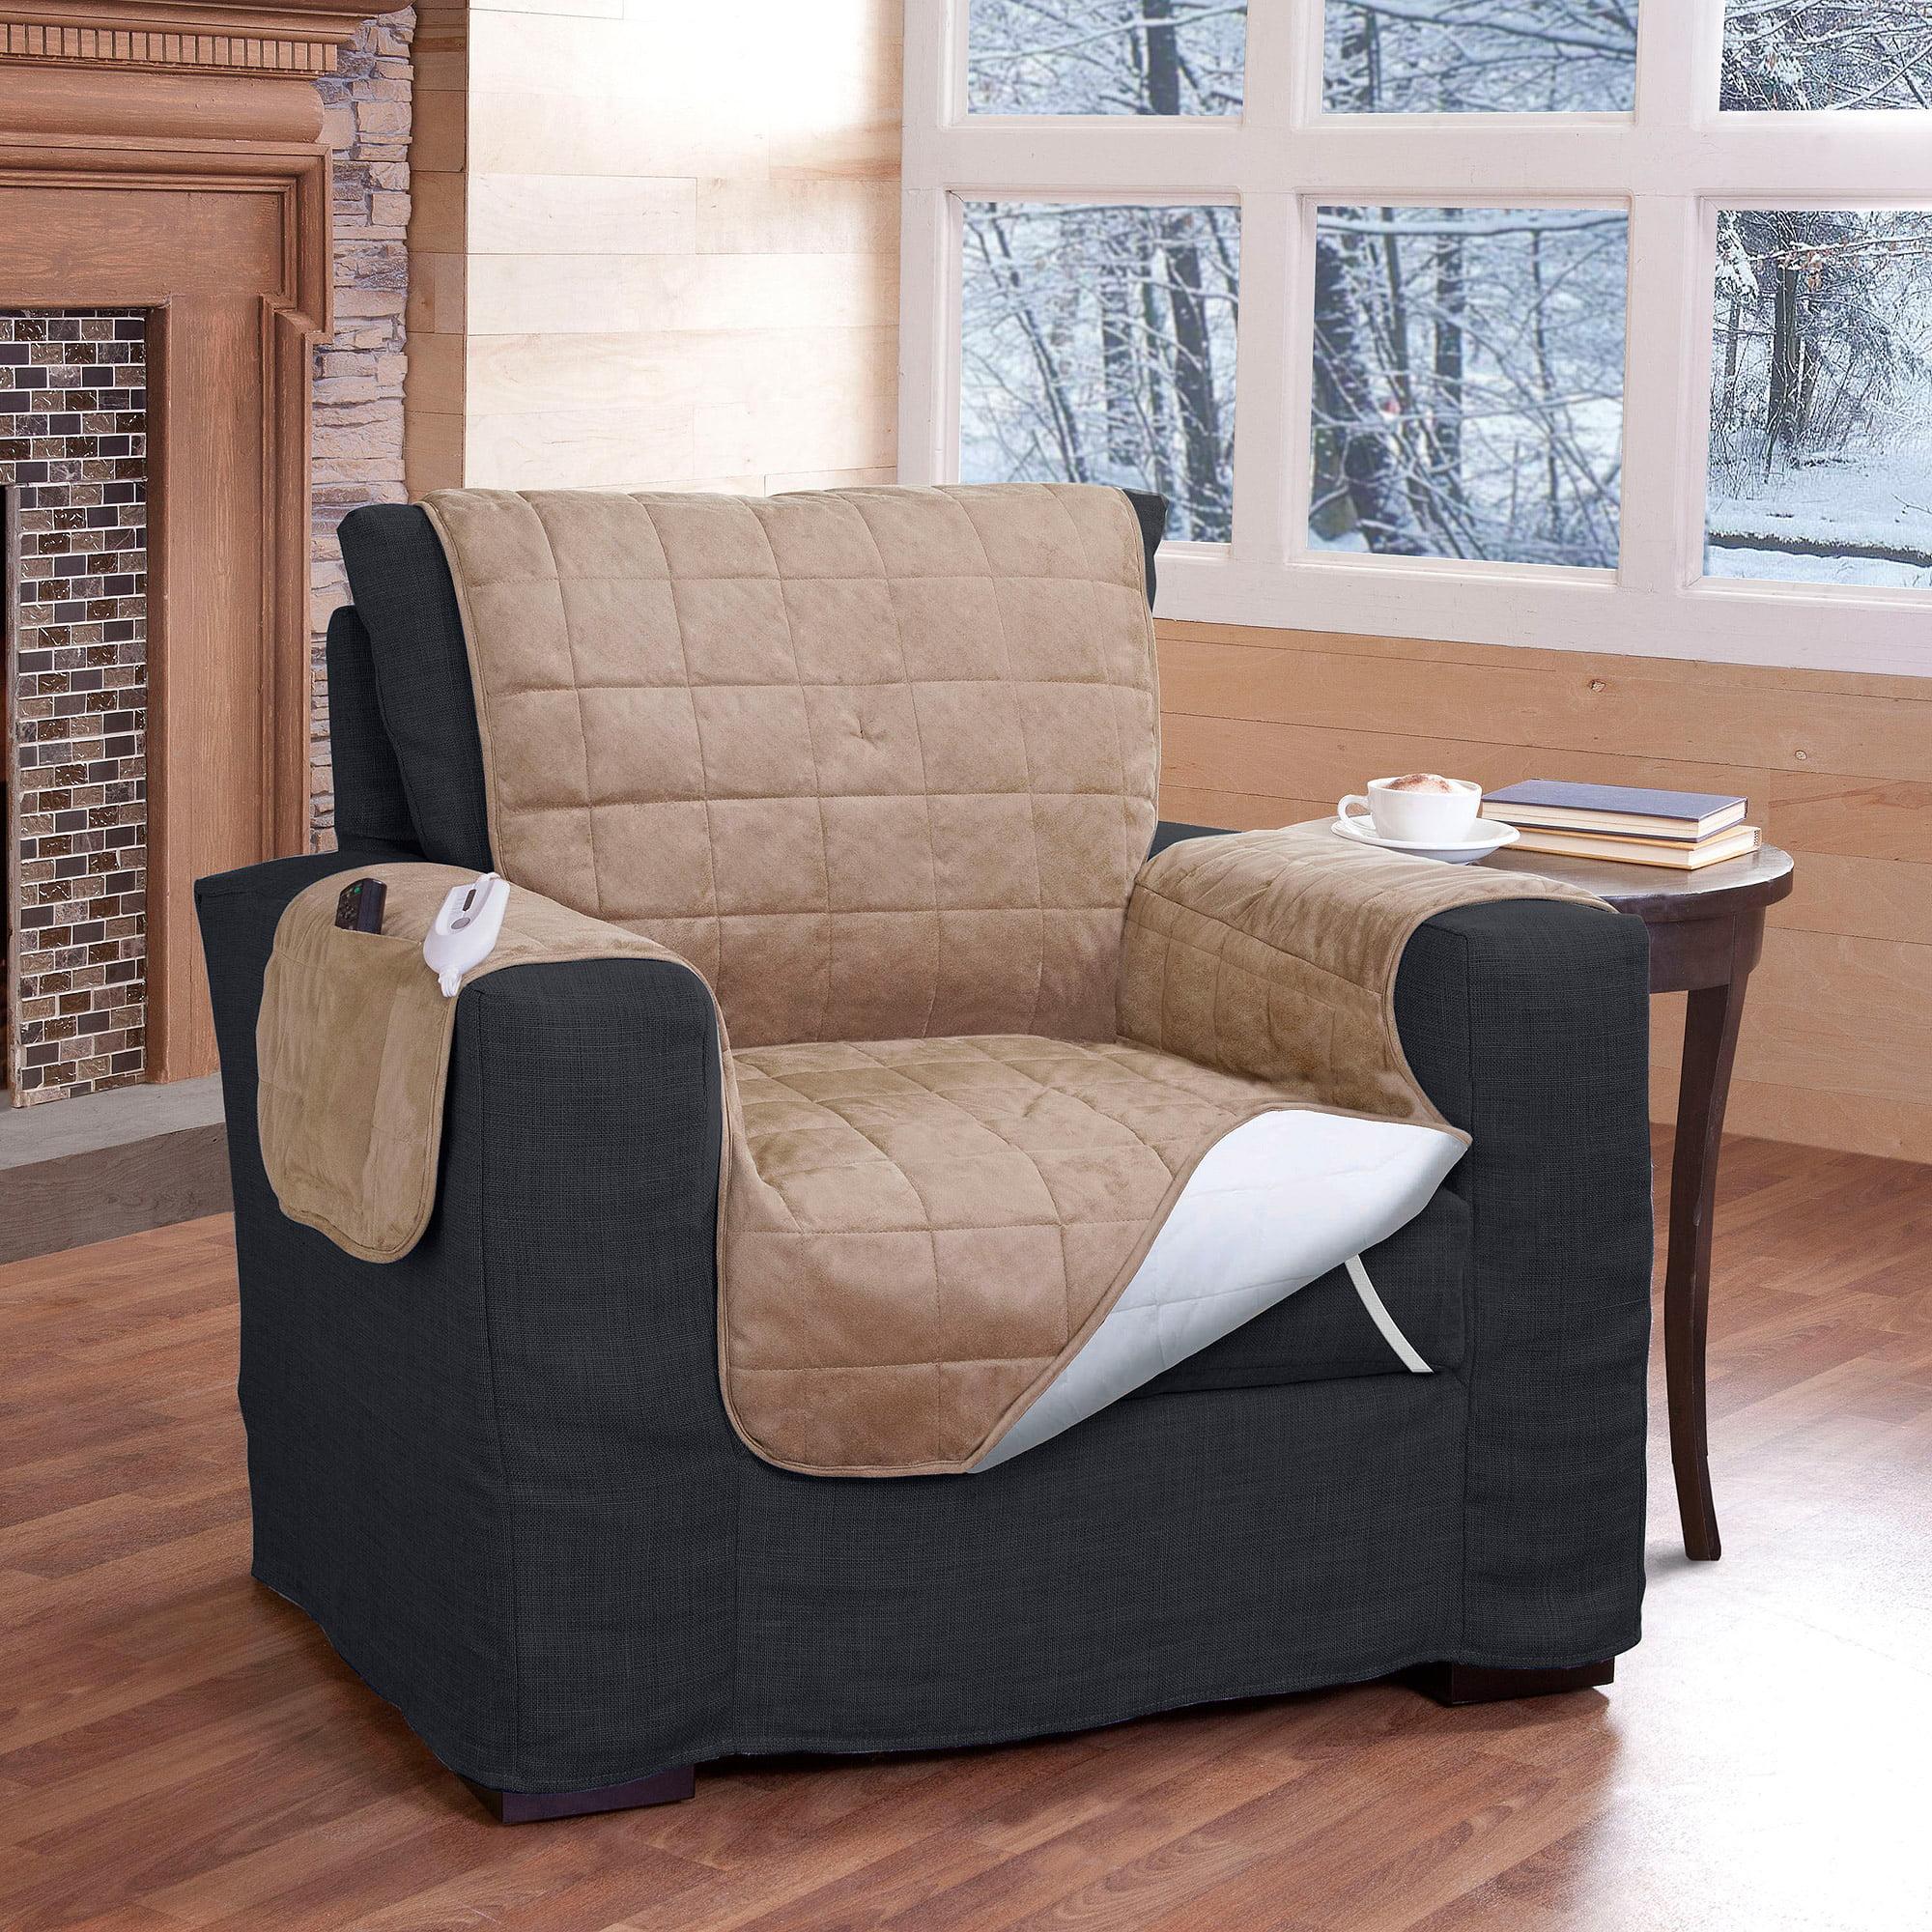 amazon serta dp kitchen dining chair adjustable rocket black gaming recliner com